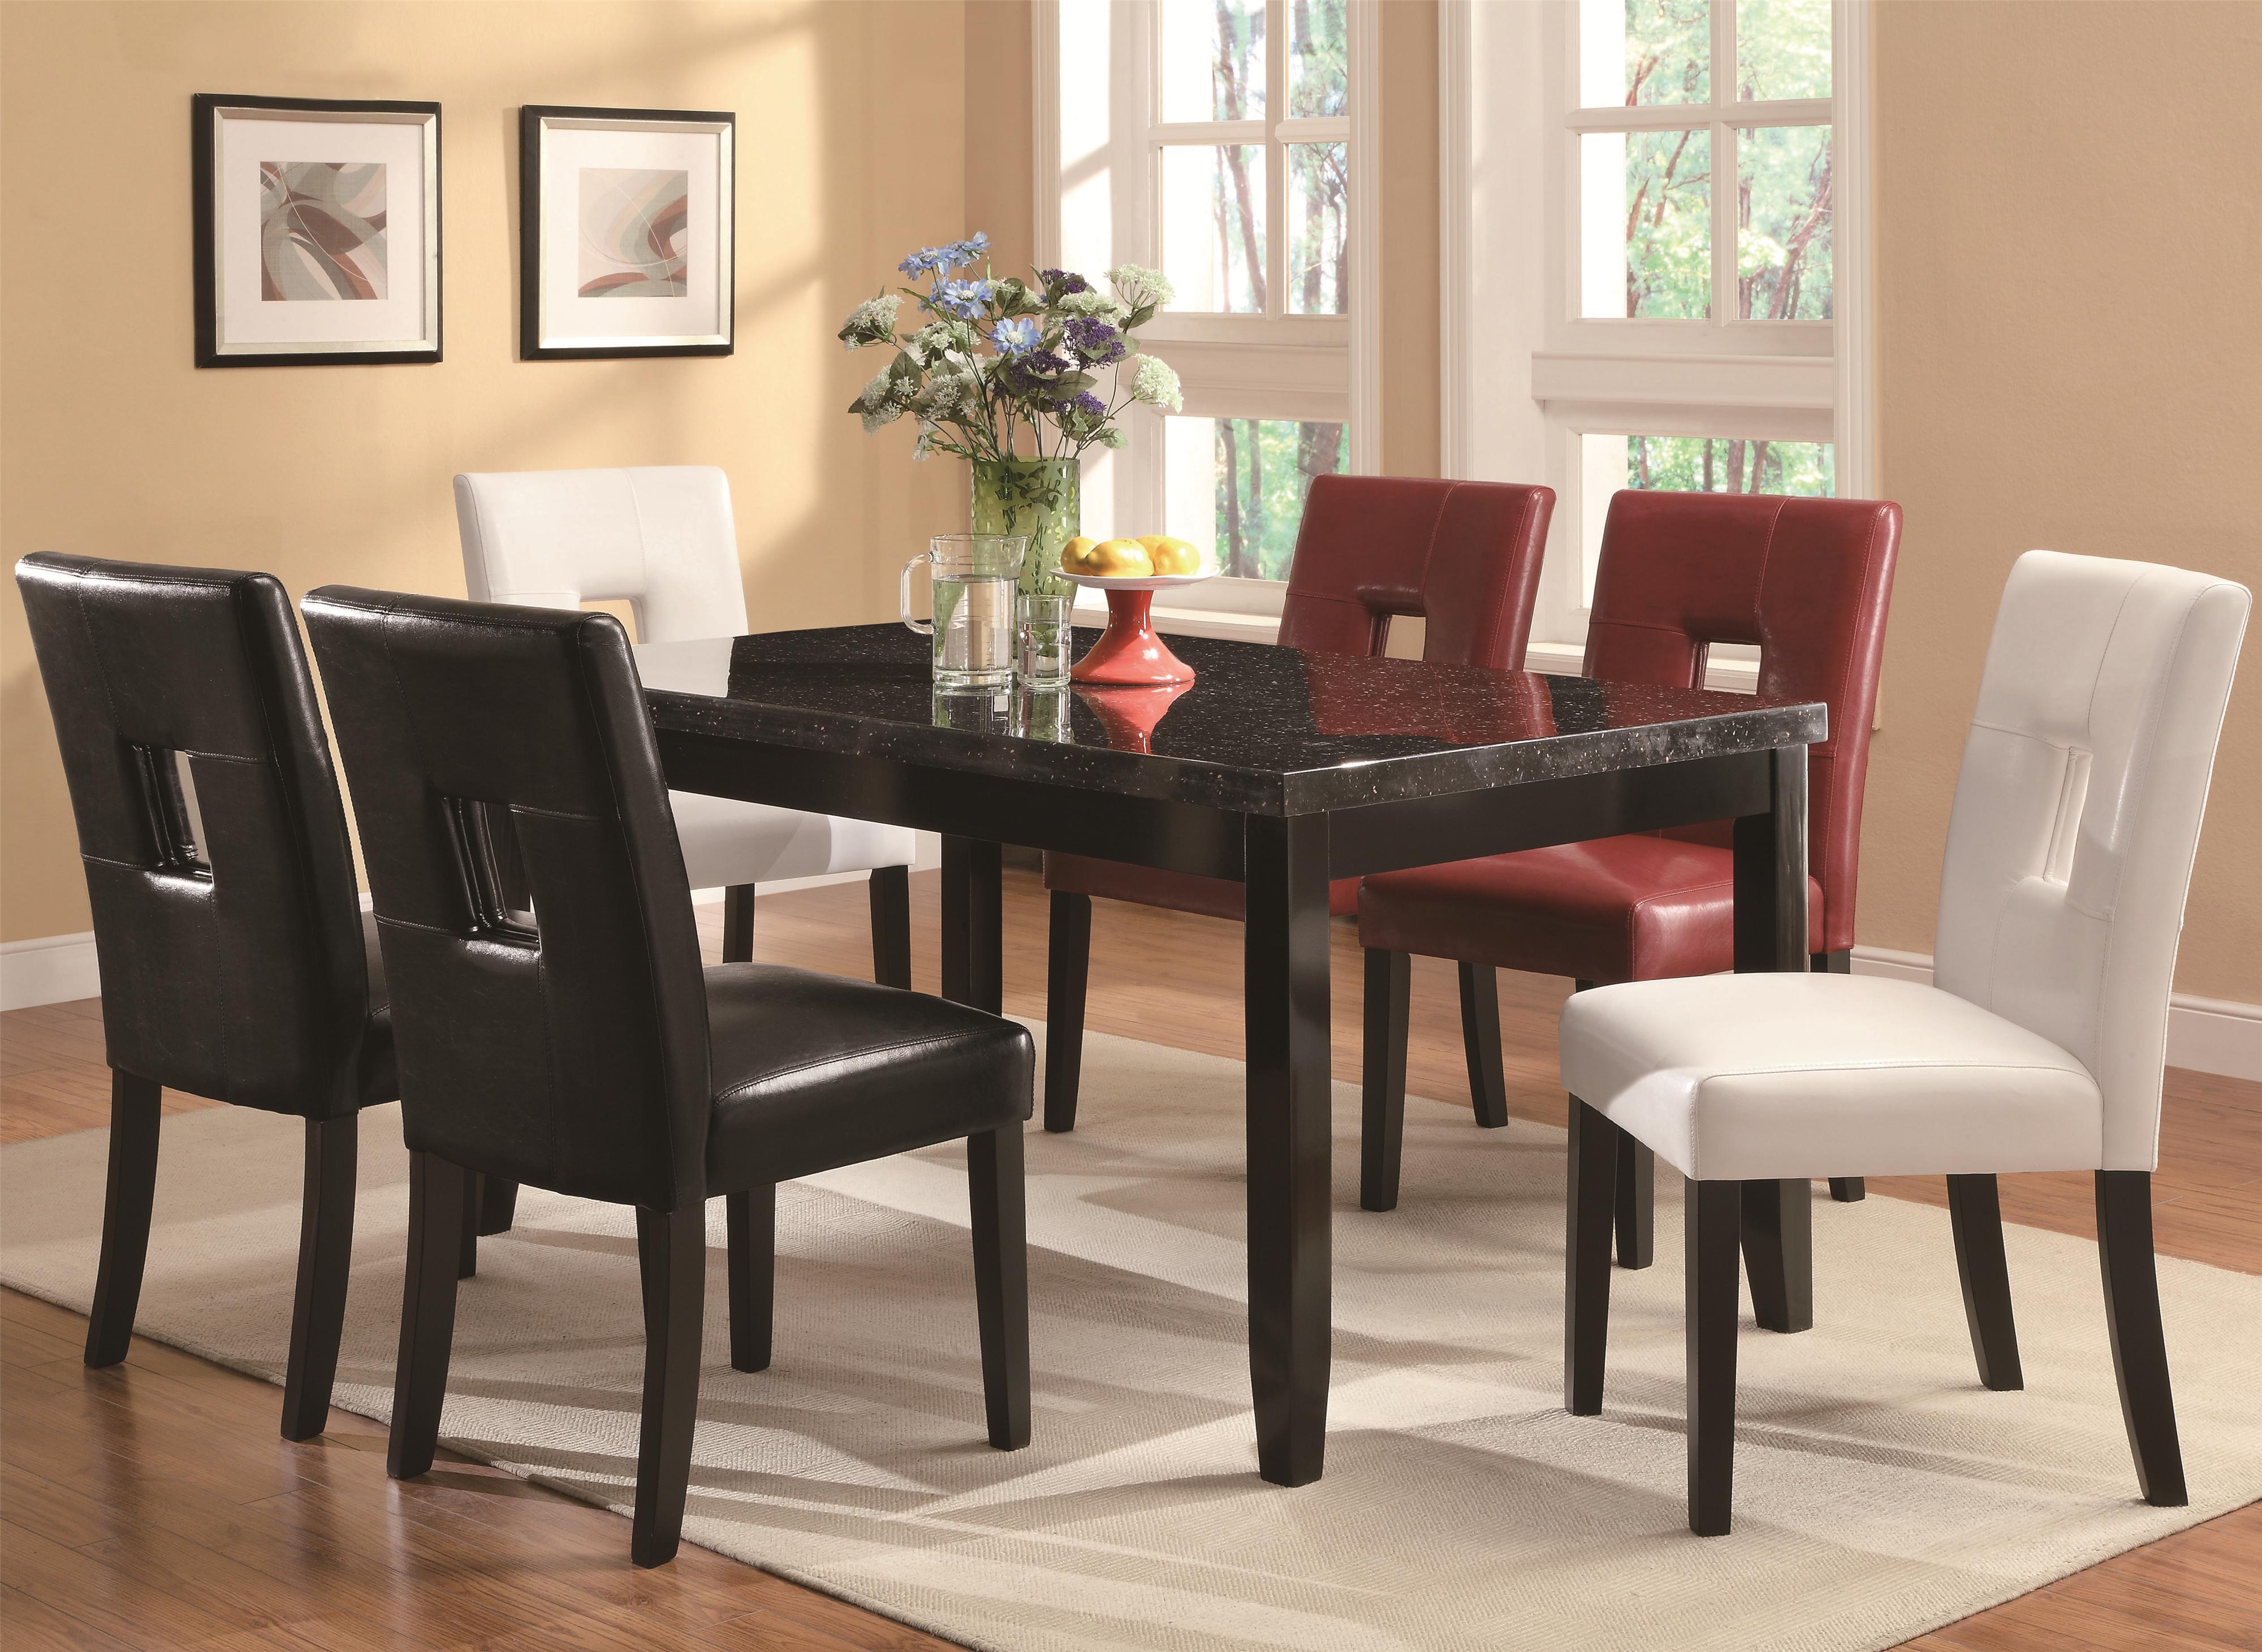 Coaster Newbridge 7 Piece Dining Table & Chair Set - Item Number: 103621+2xBLK+2xRED+2xWHT